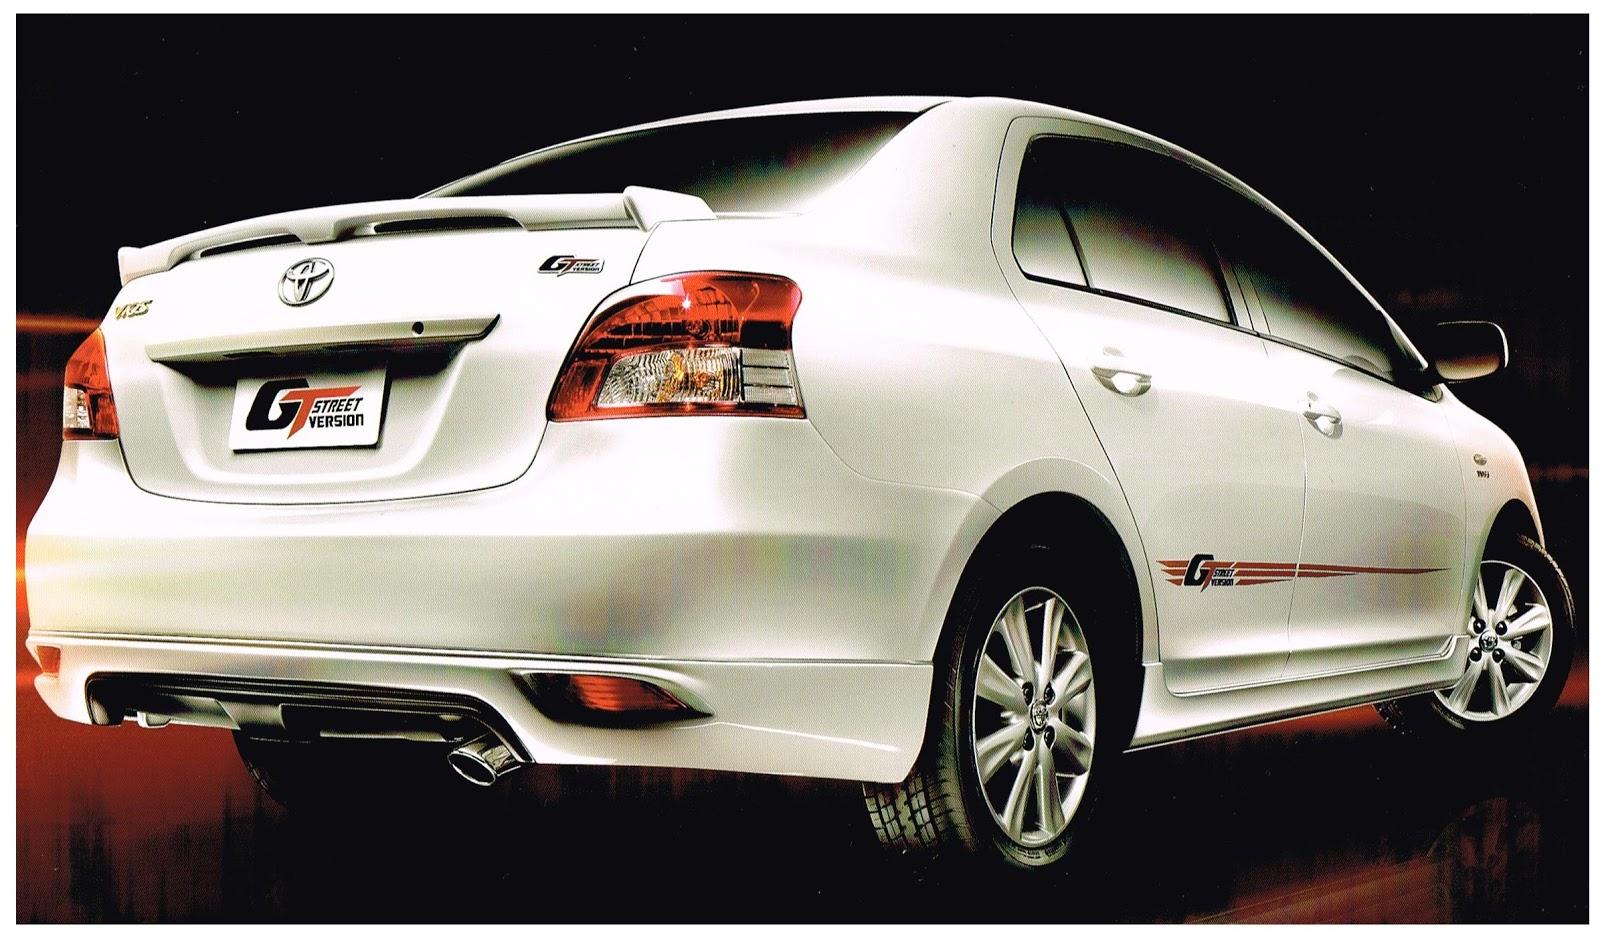 Harga New Yaris Trd Sportivo 2014 Kapasitas Oli Grand Avanza Toyota Genuine Accessories Vios Gt Street Version 08